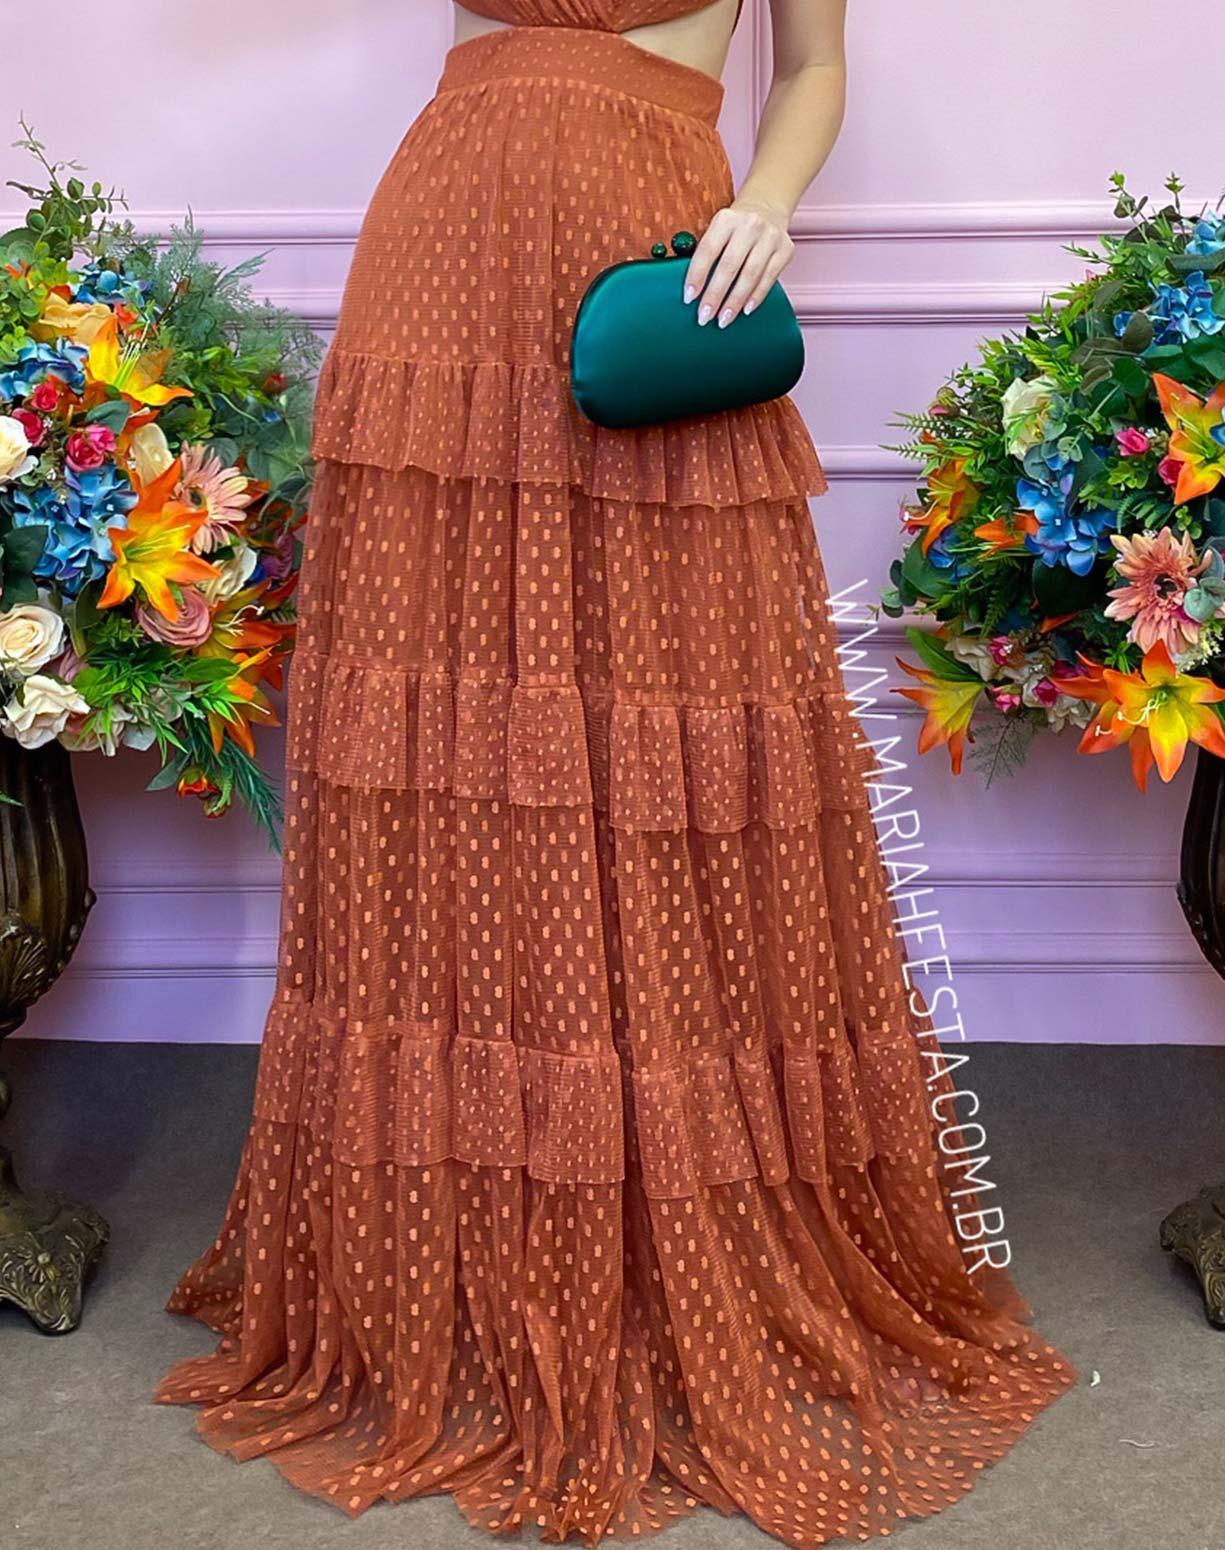 Vestido Terracota em Tule Texturizado